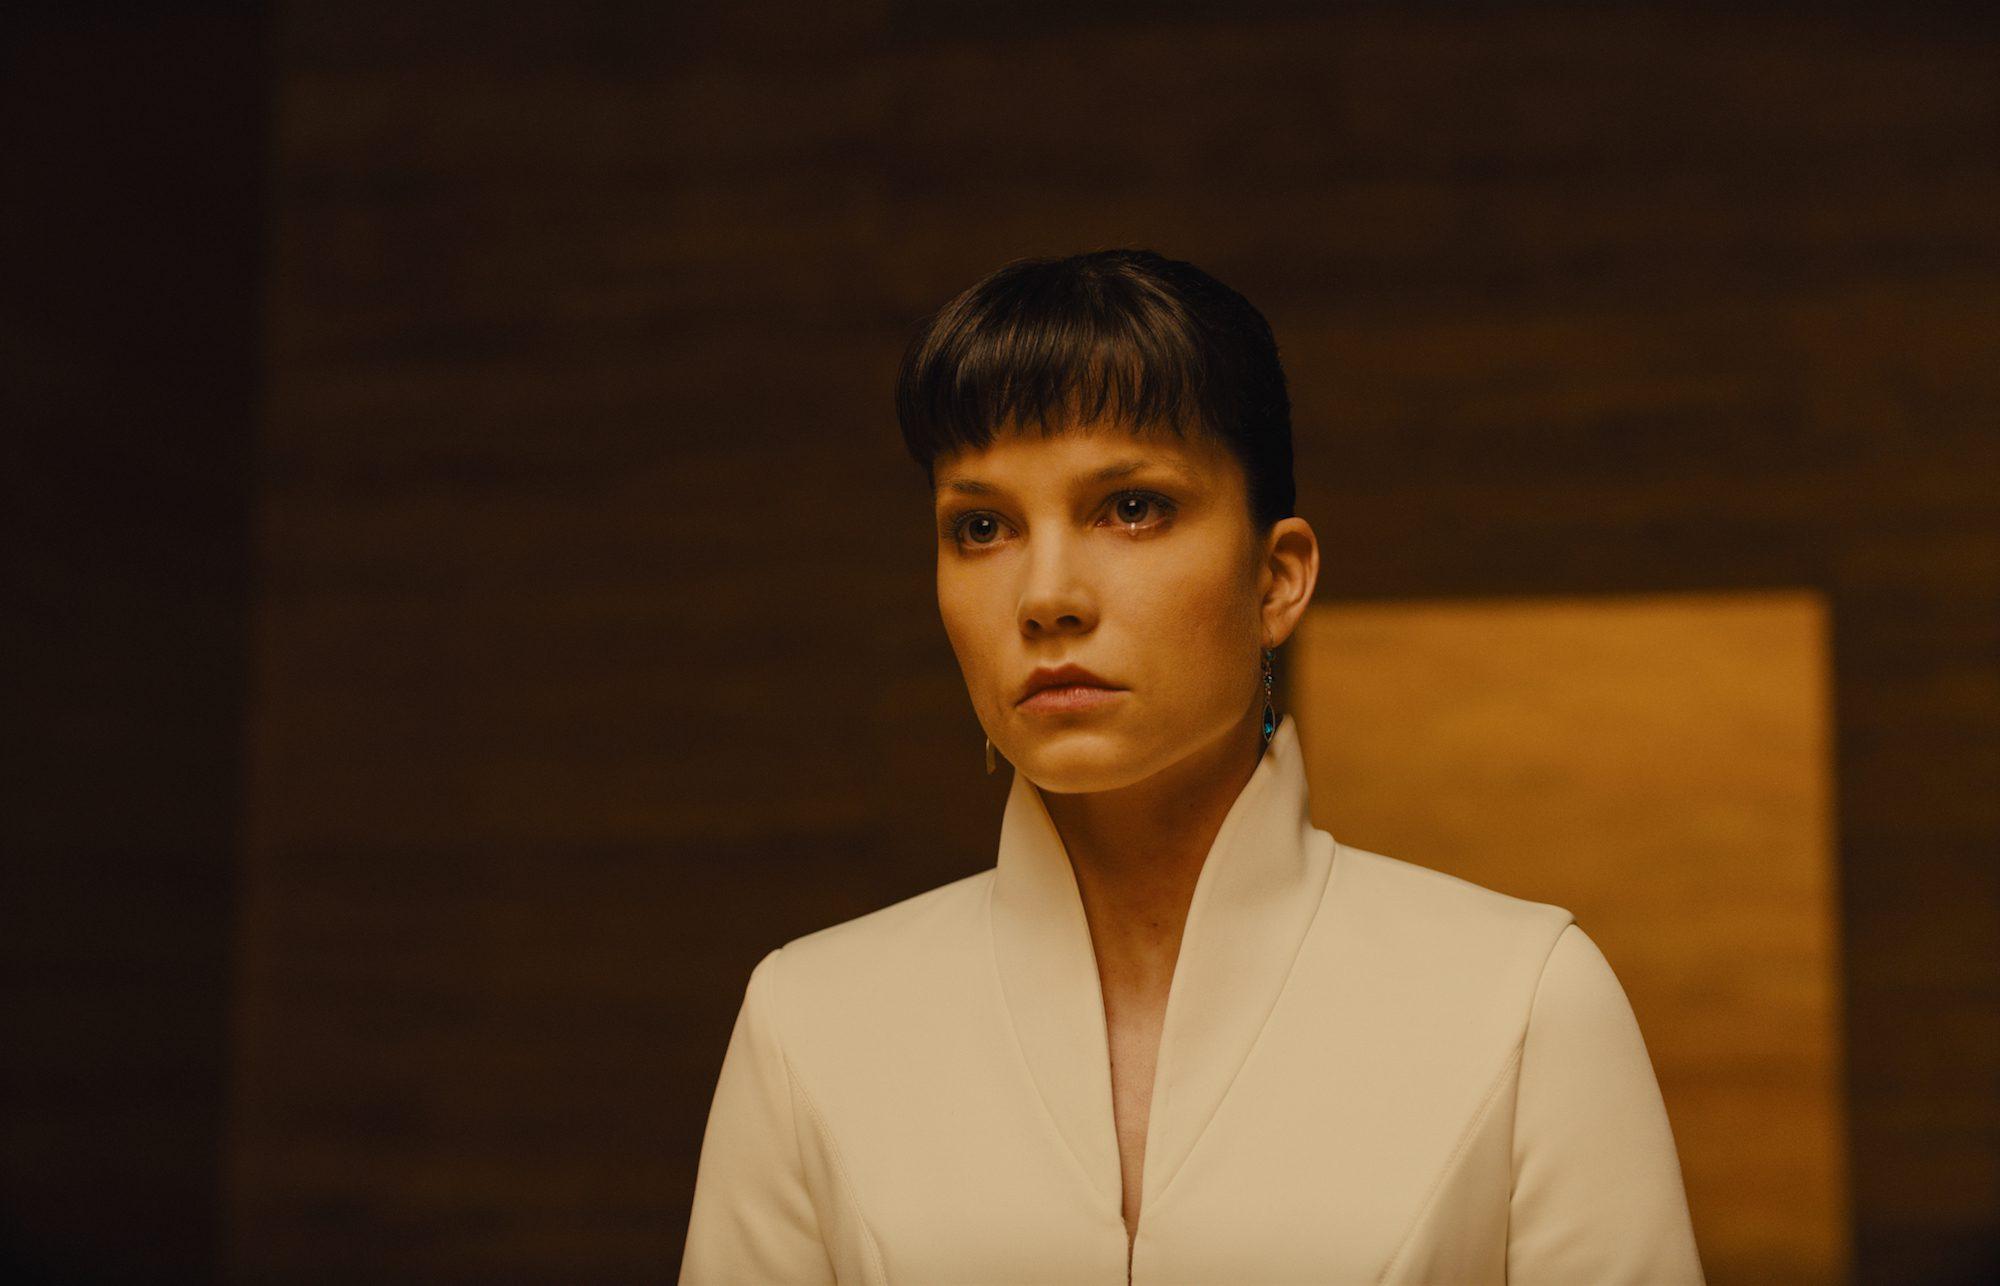 Blade Runner 2049 (Sony Pictures Releasing)